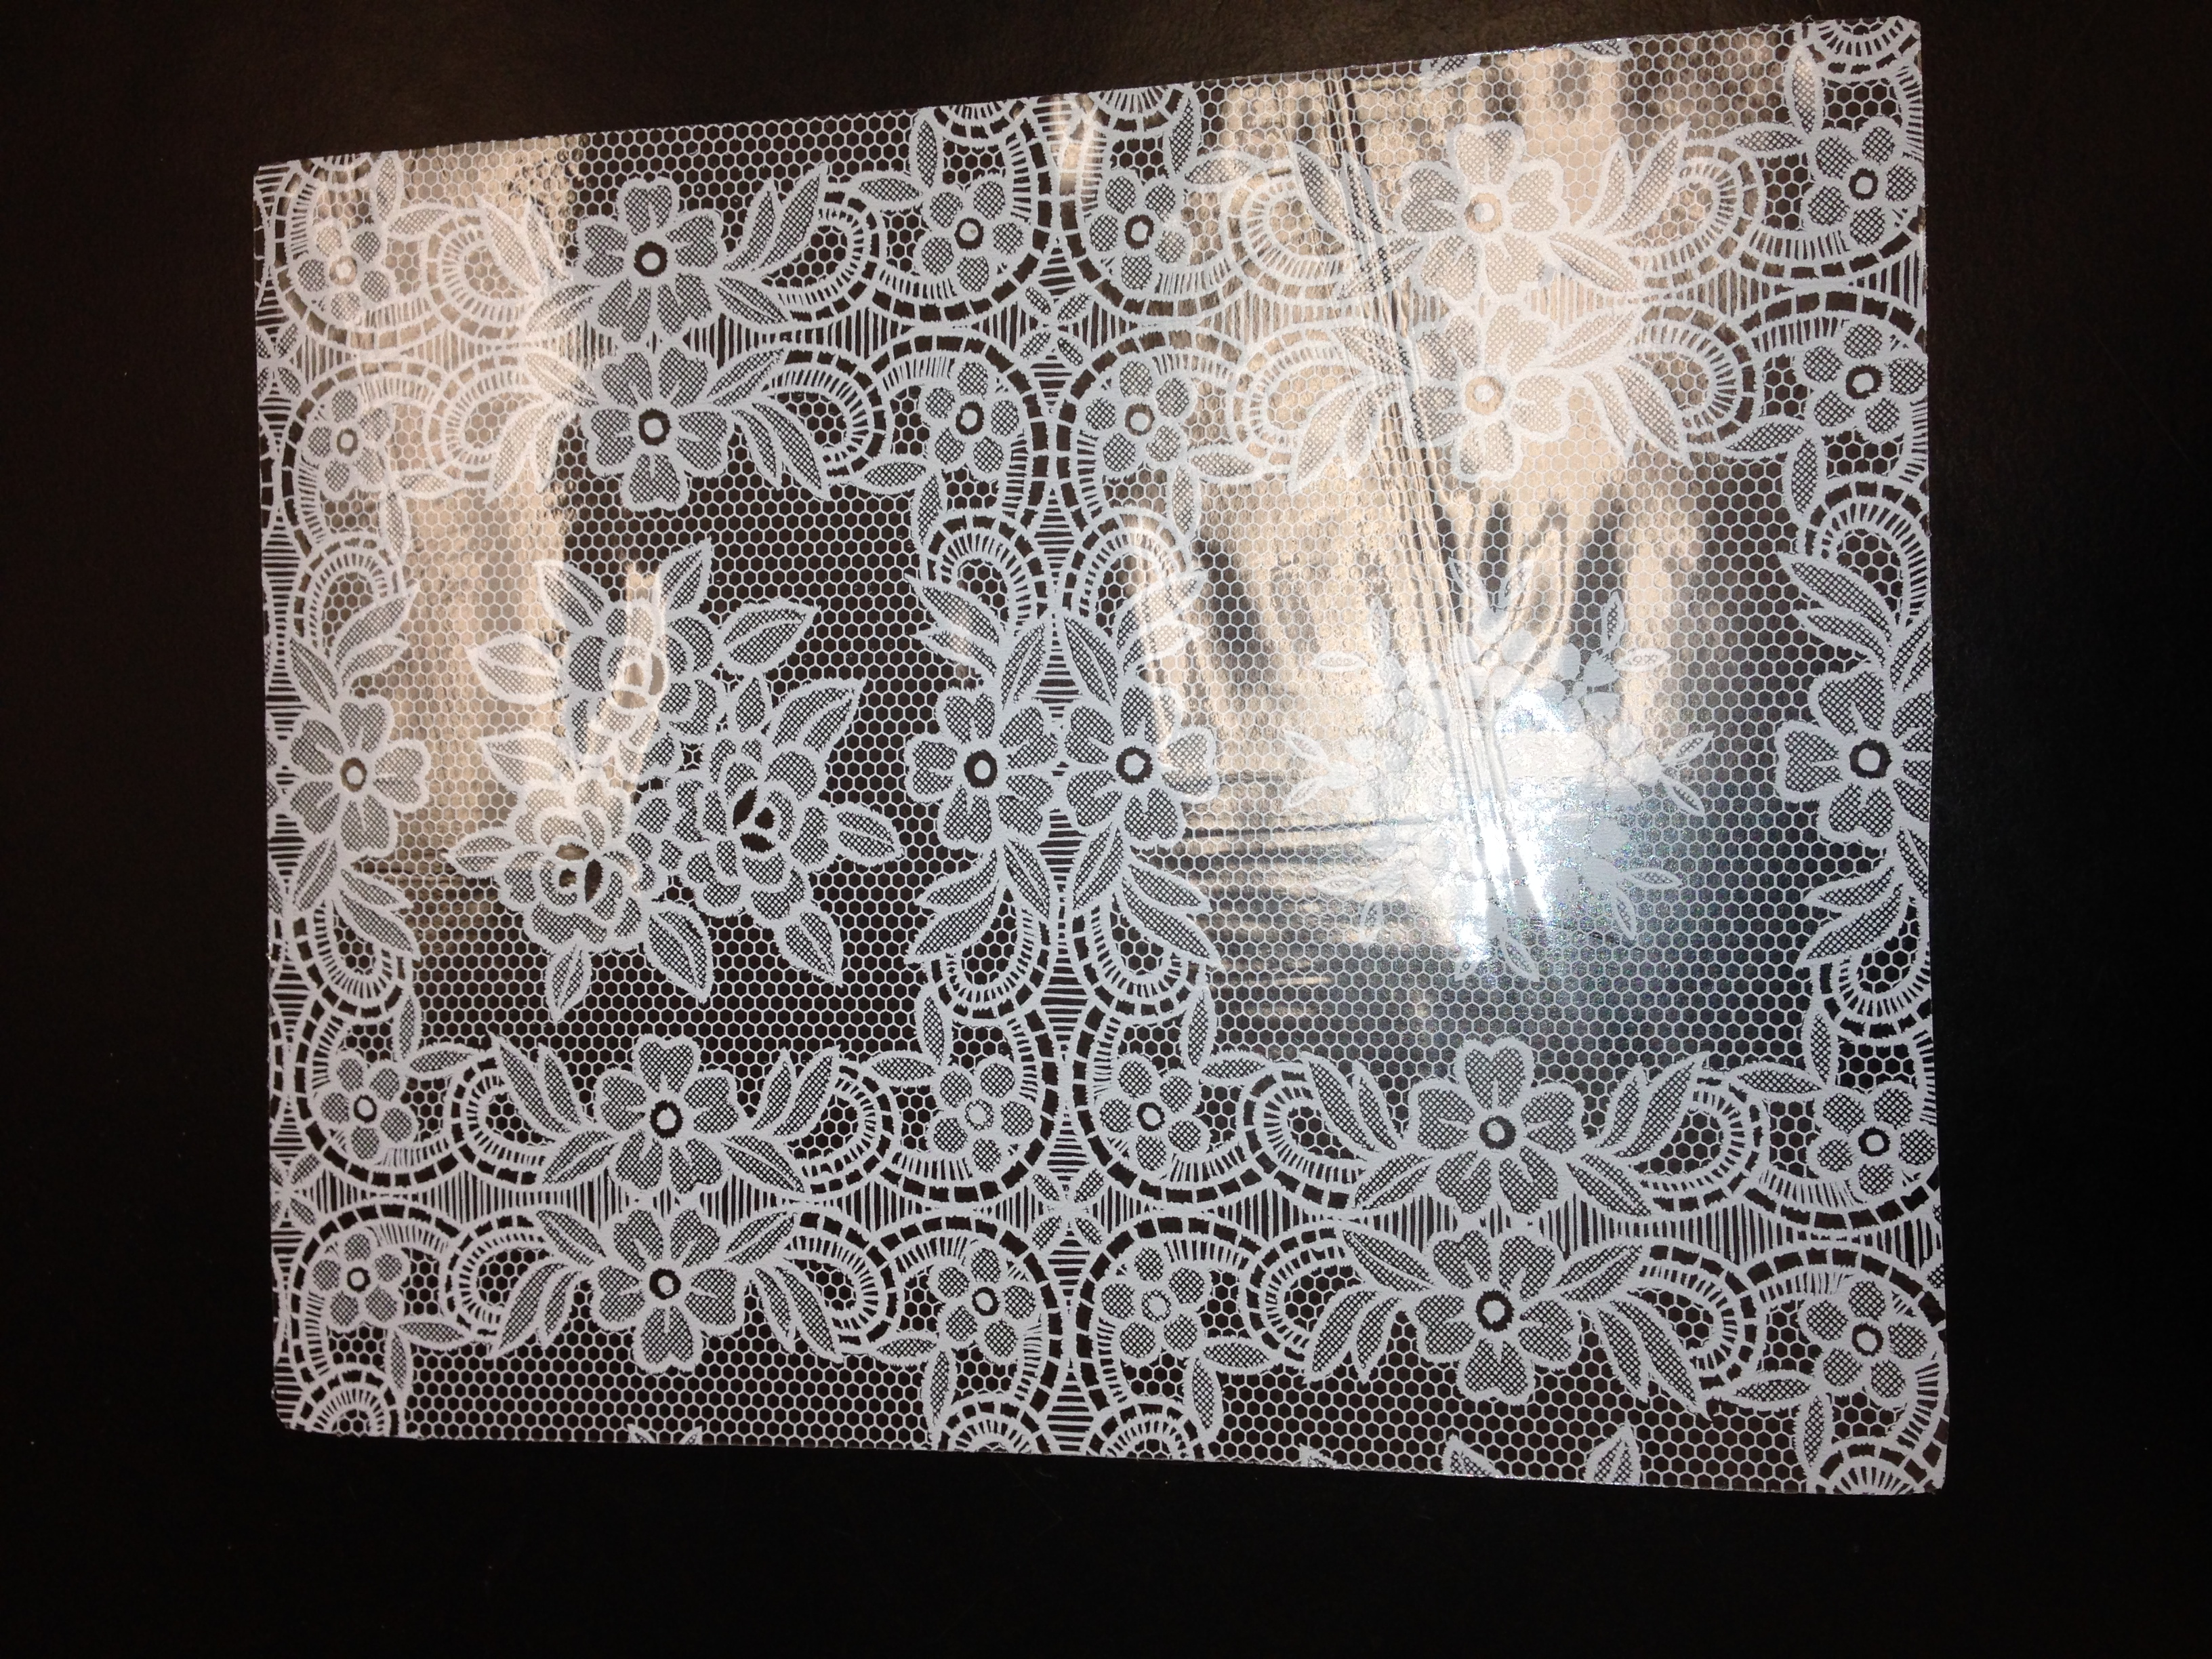 Vinyl Rolls with Print : BurlapFabric com, Burlap for Wedding and